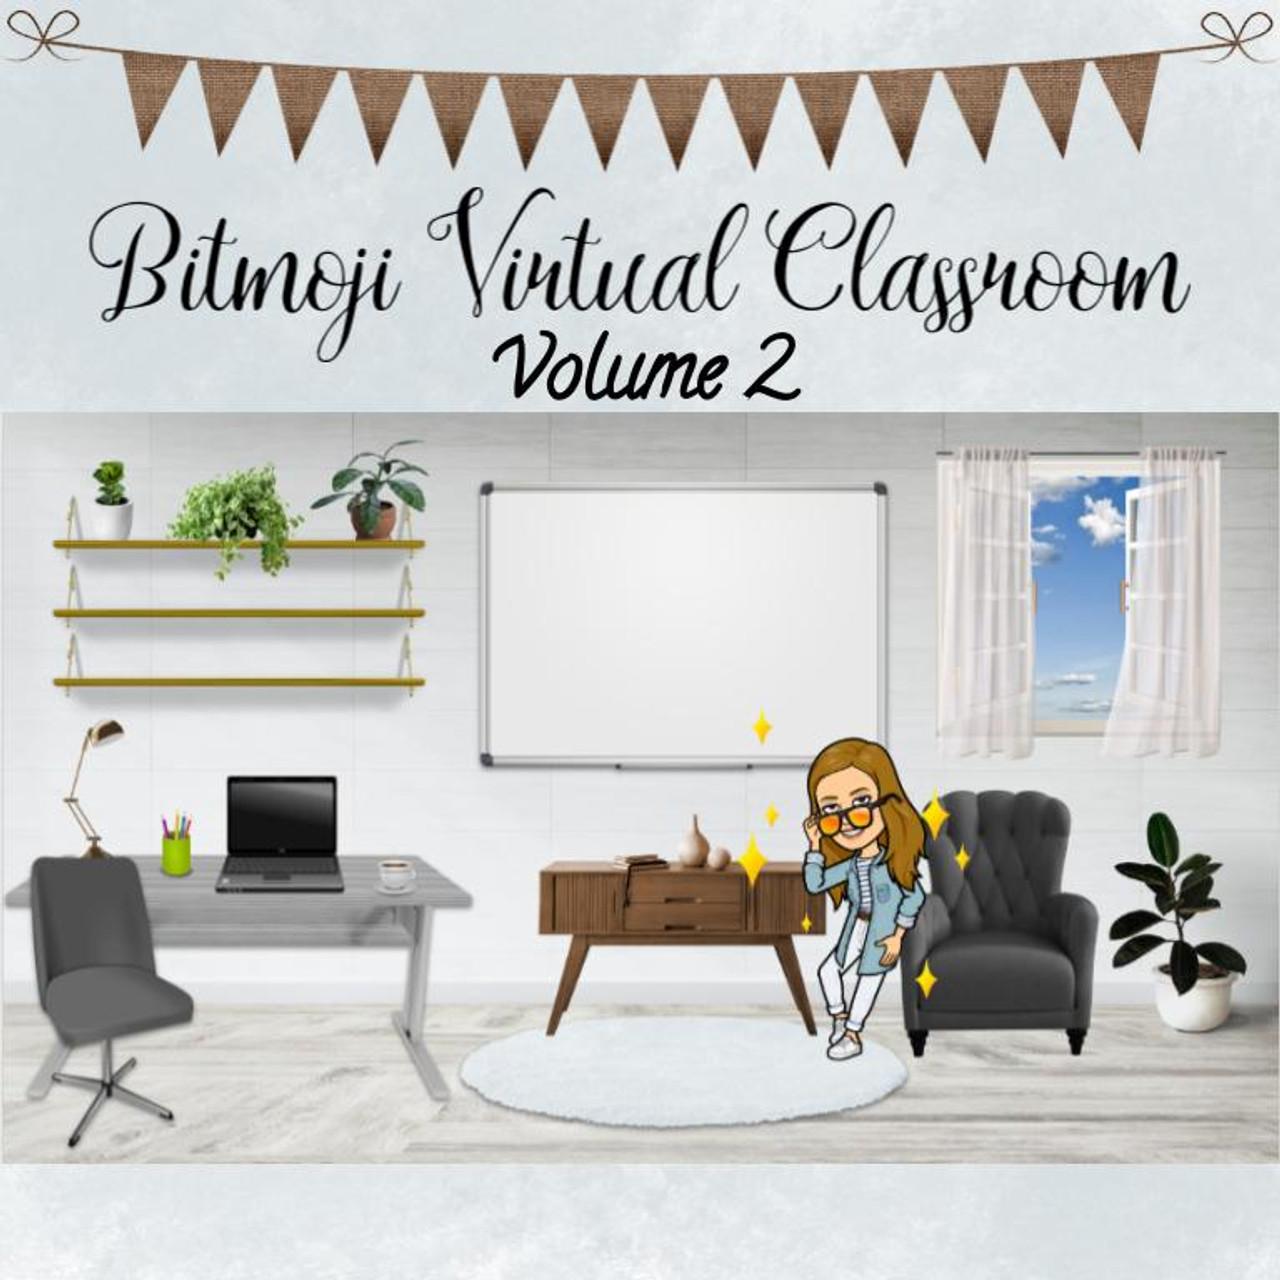 Bitmoji Virtual Classroom Vol. 2